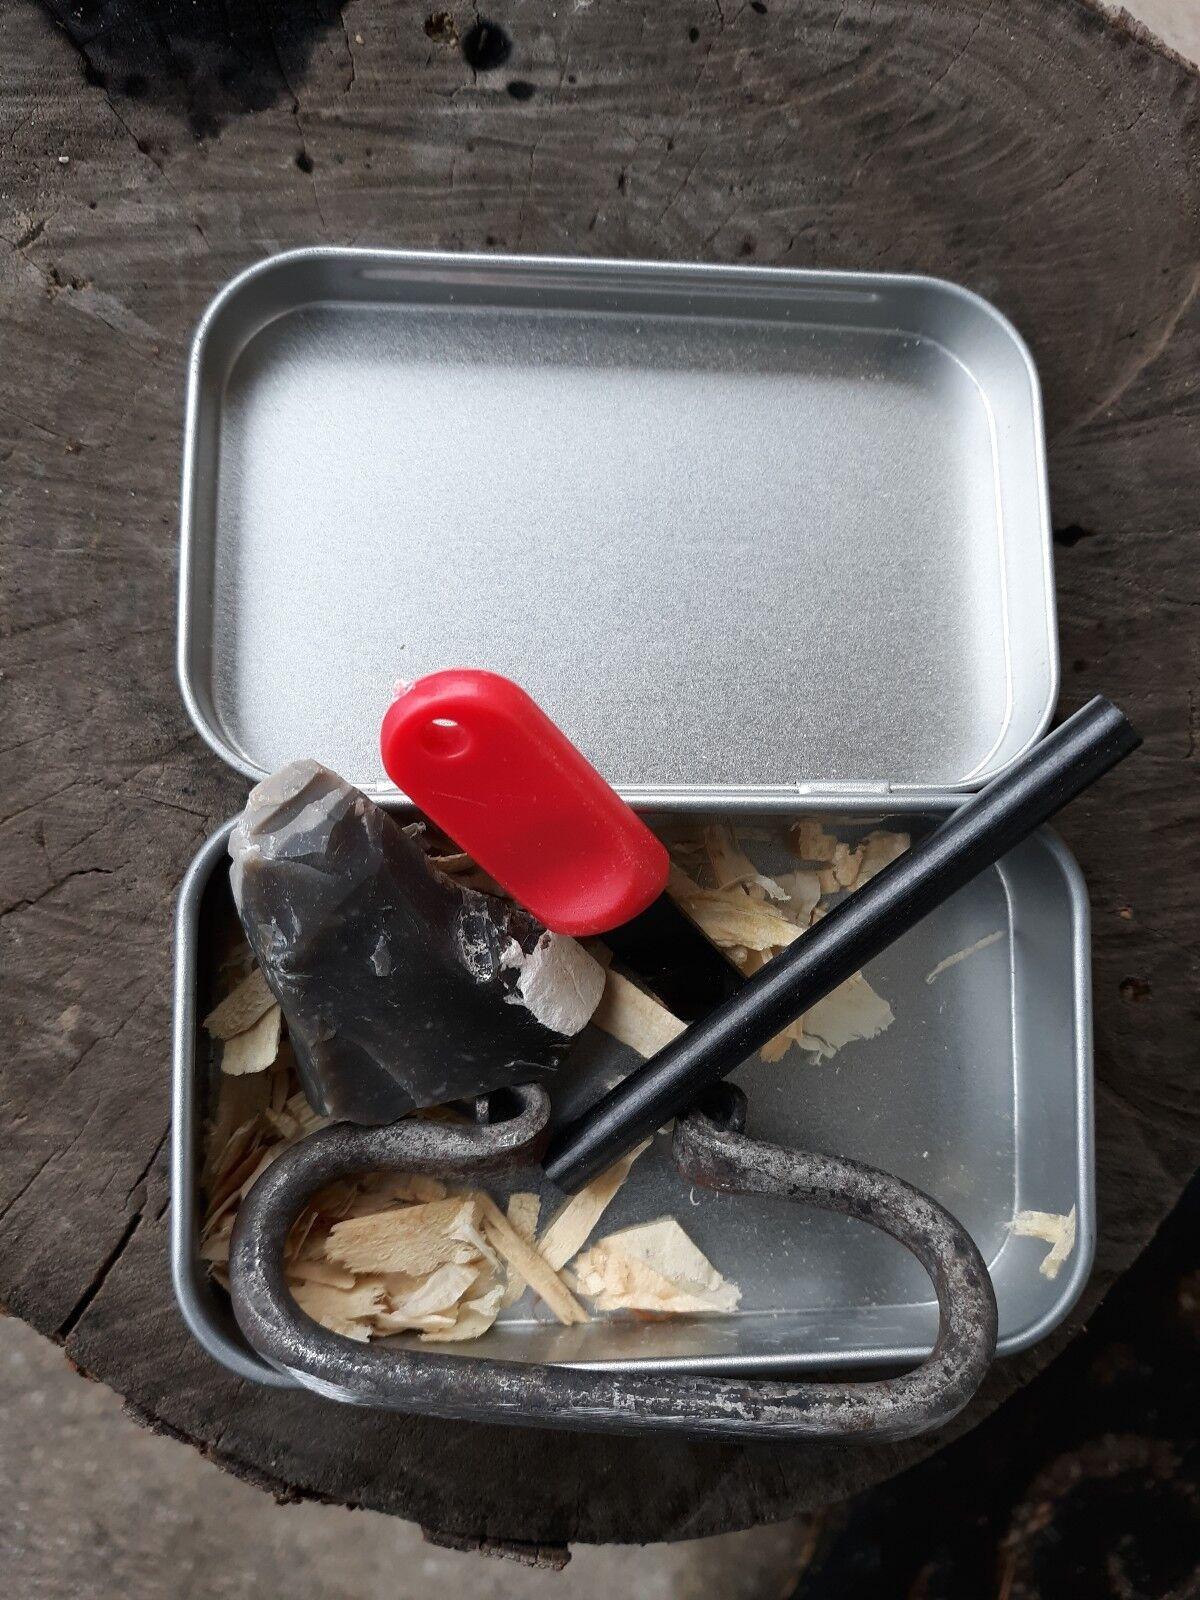 Flint and Steel Kit flint striker  W  Hinged Tin Box firesteel ferro rod striker  save 60% discount